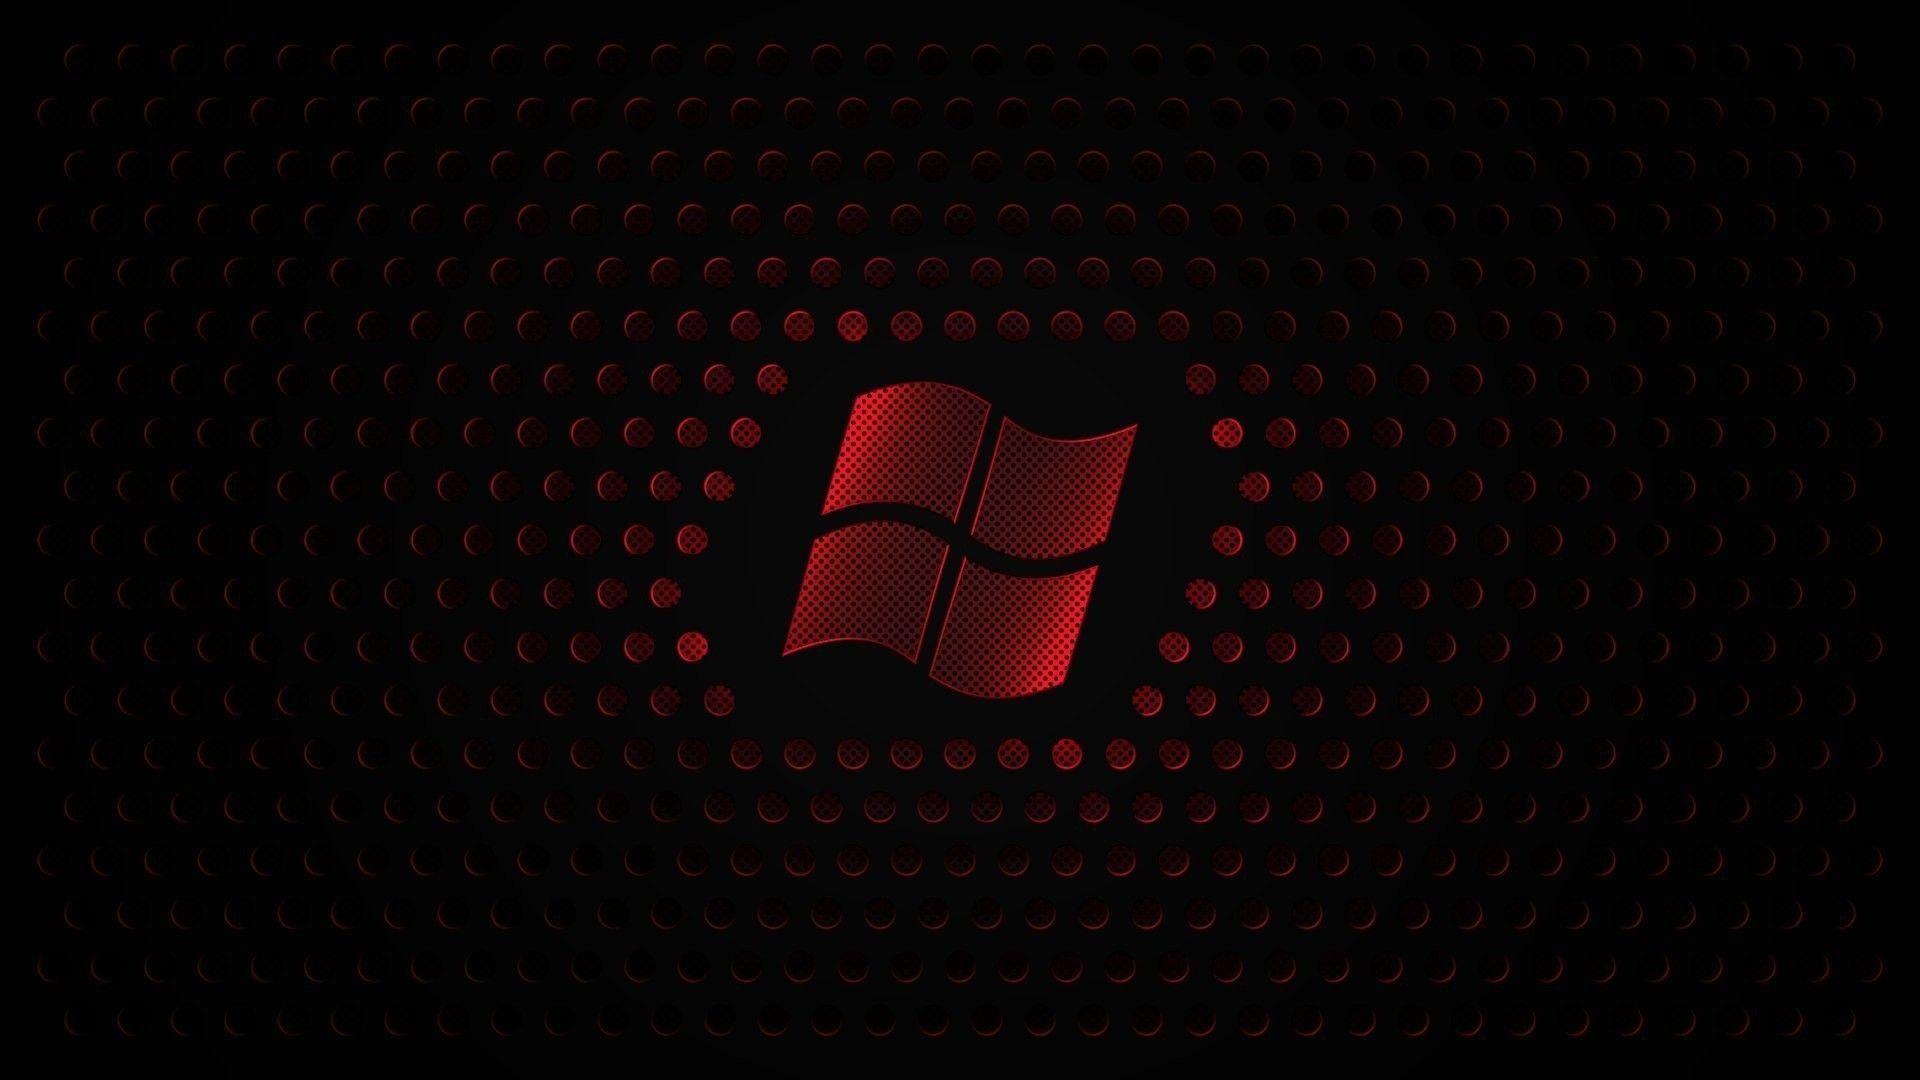 Red Windows 7 Microsoft Logo 8 Wallpaper In 2020 Windows Wallpaper Black And Blue Background Dark Wallpaper